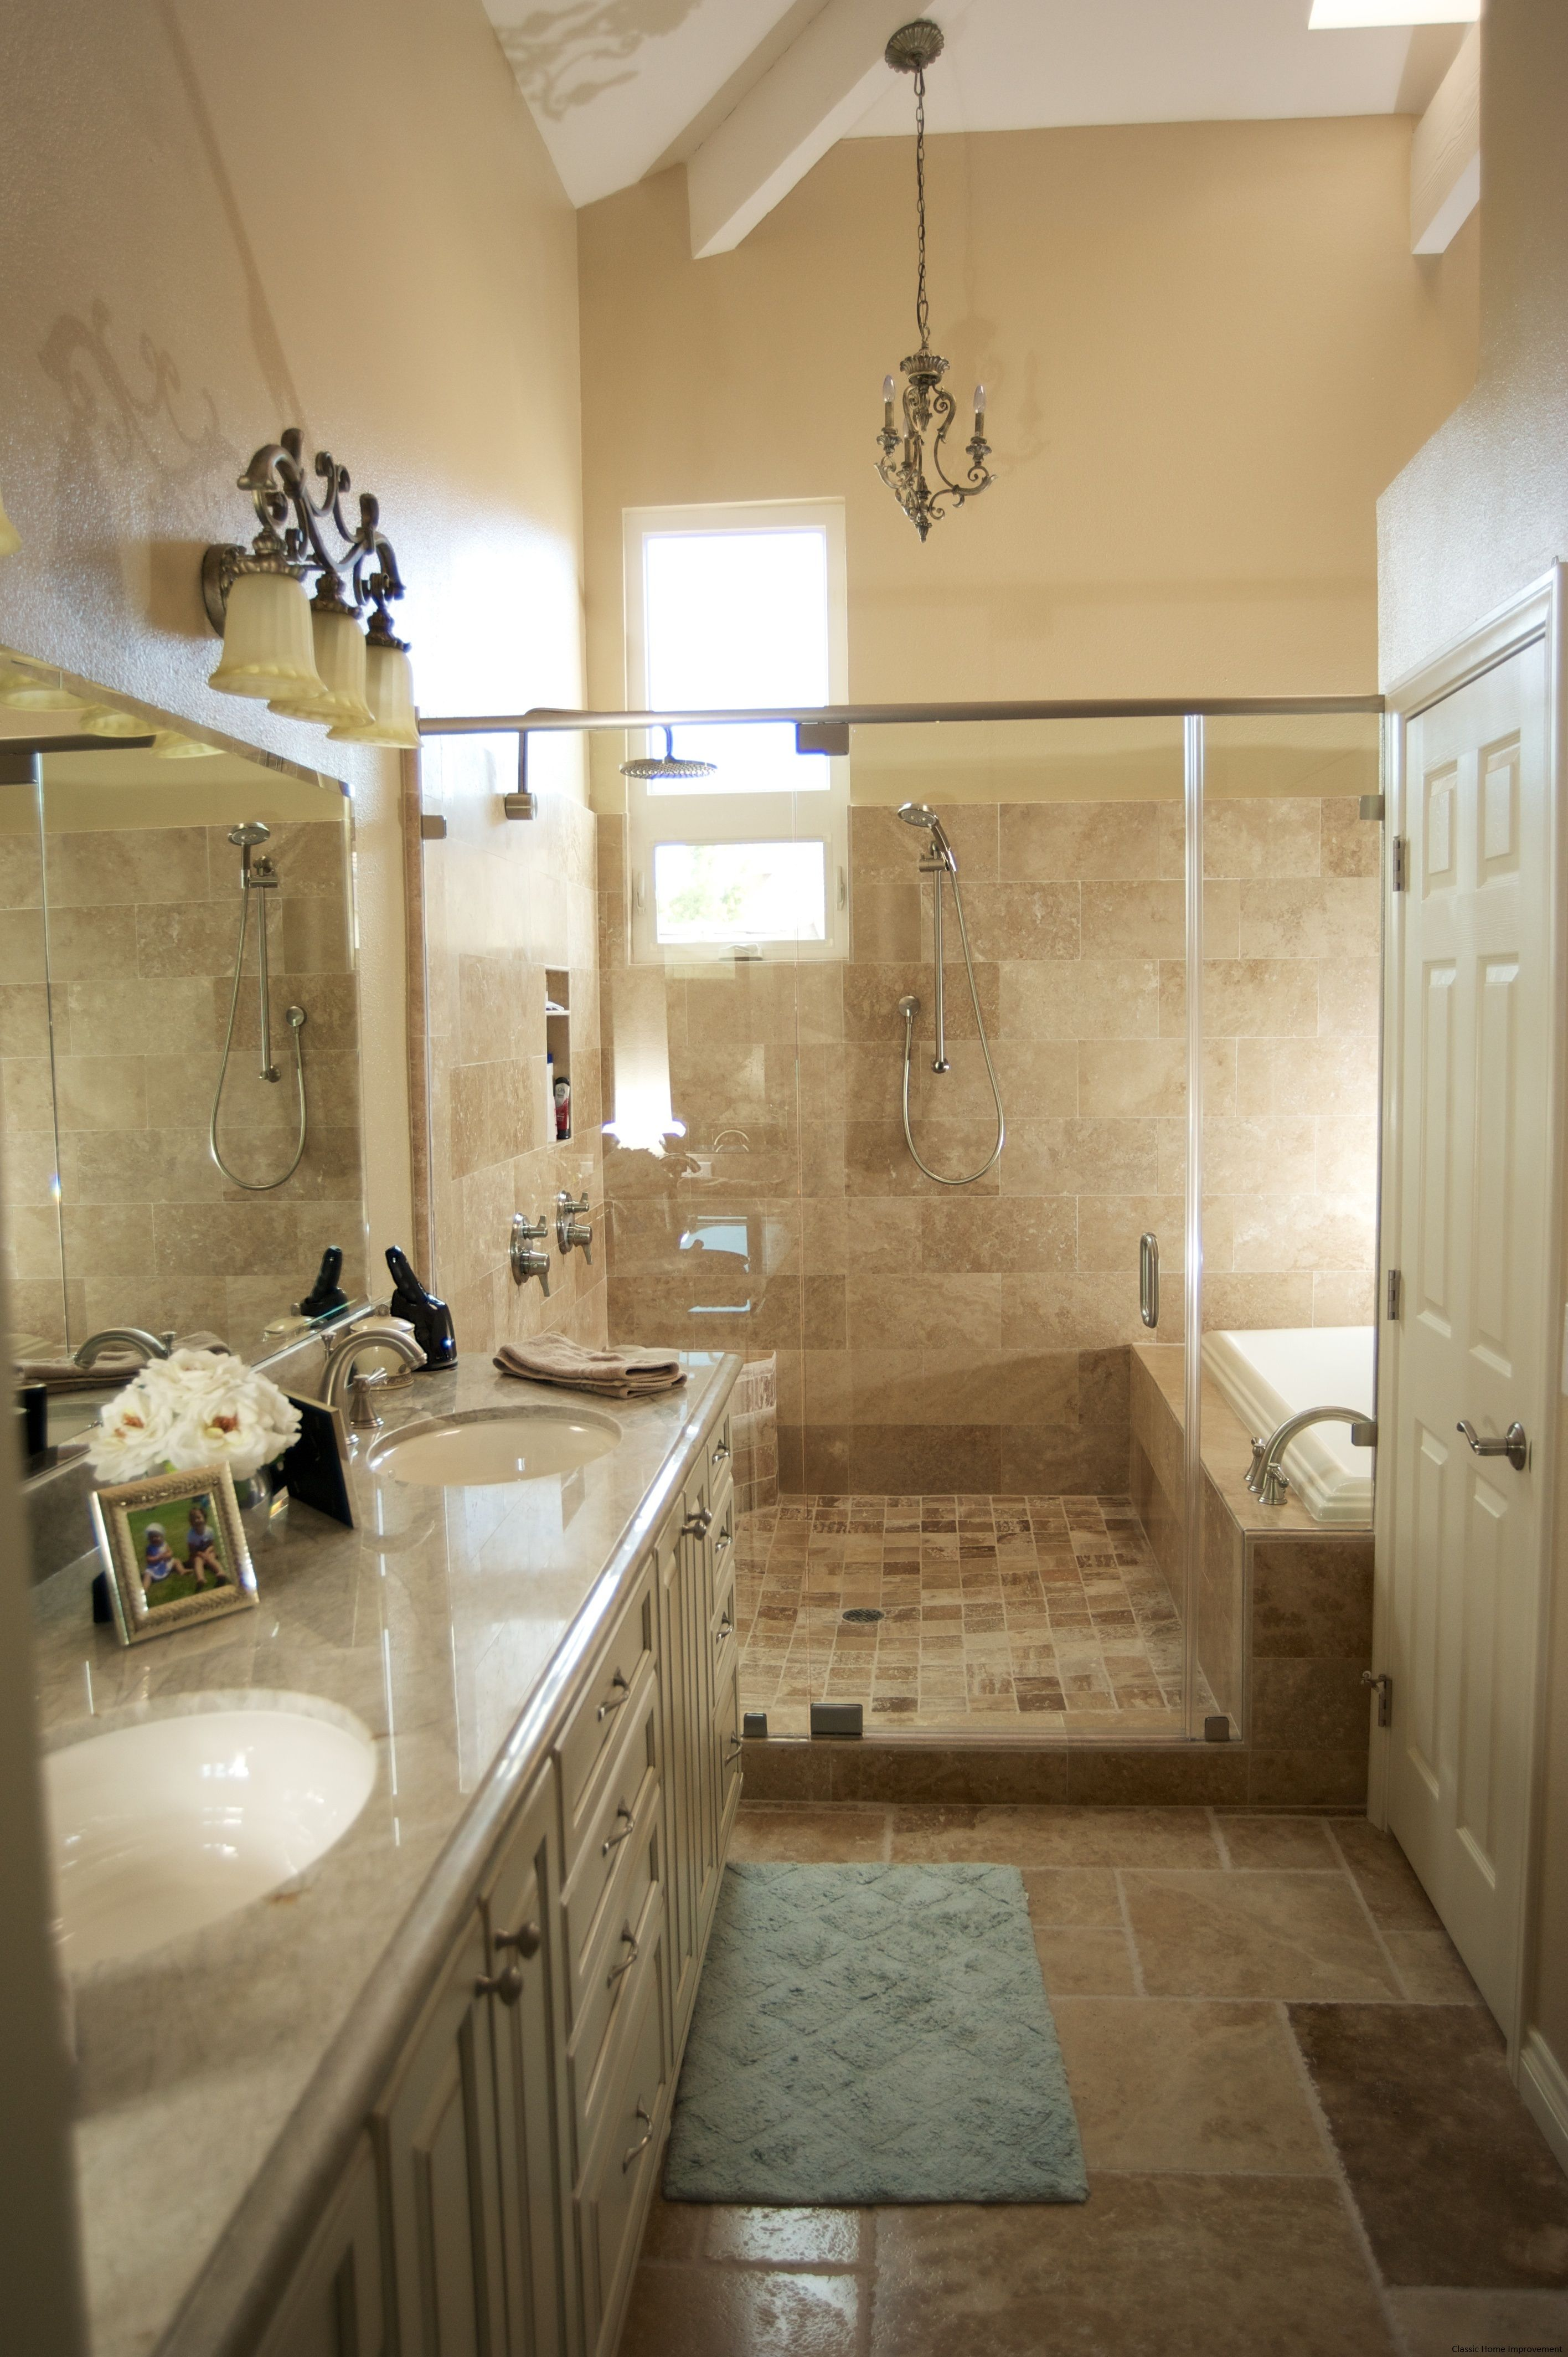 Glass Shower Door Installation Costs Price To Replace Shower Door Install Glass Shower Door Shower Door Installation Shower Doors